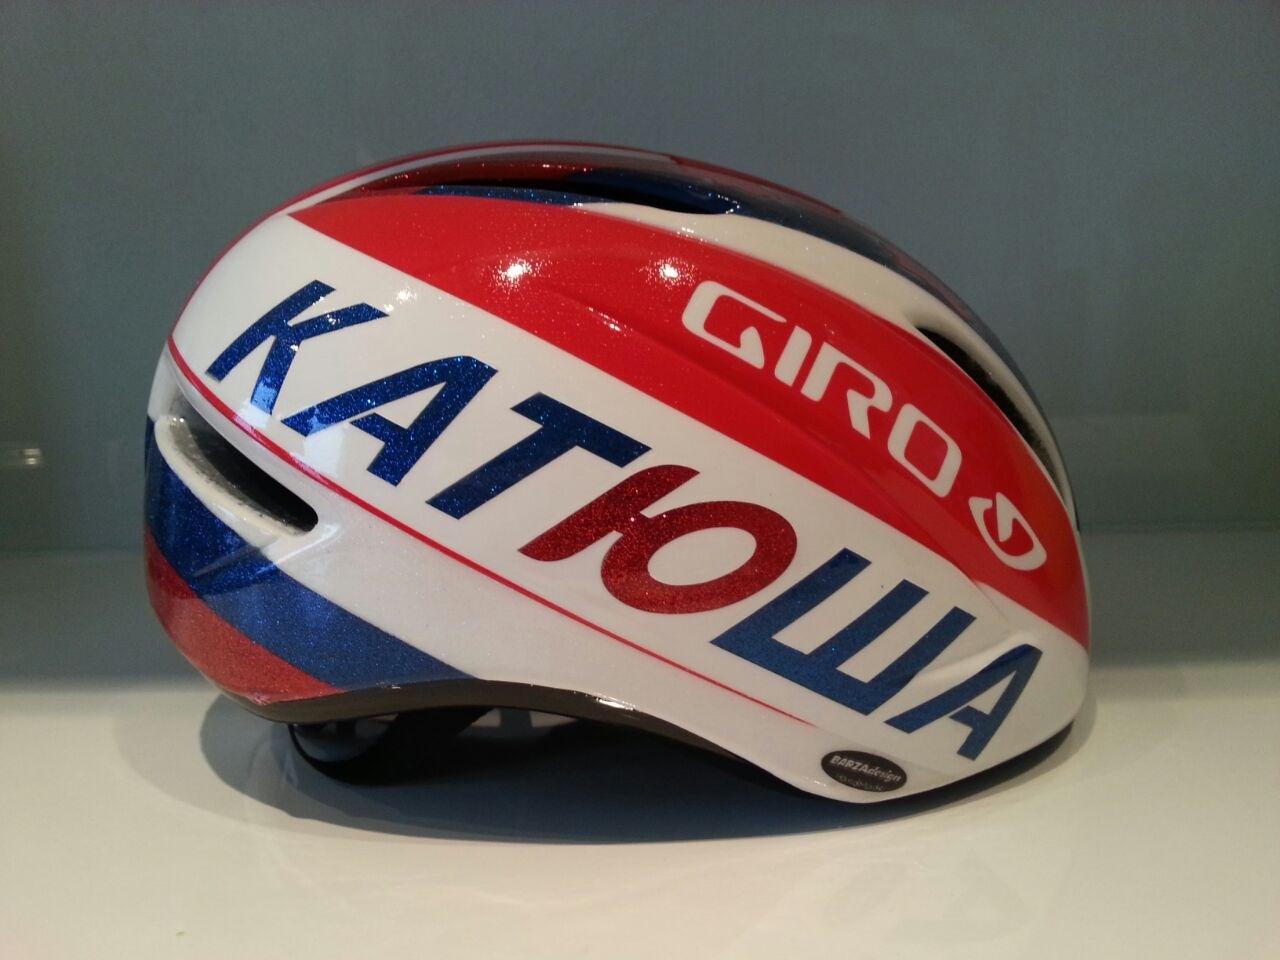 team Katusha